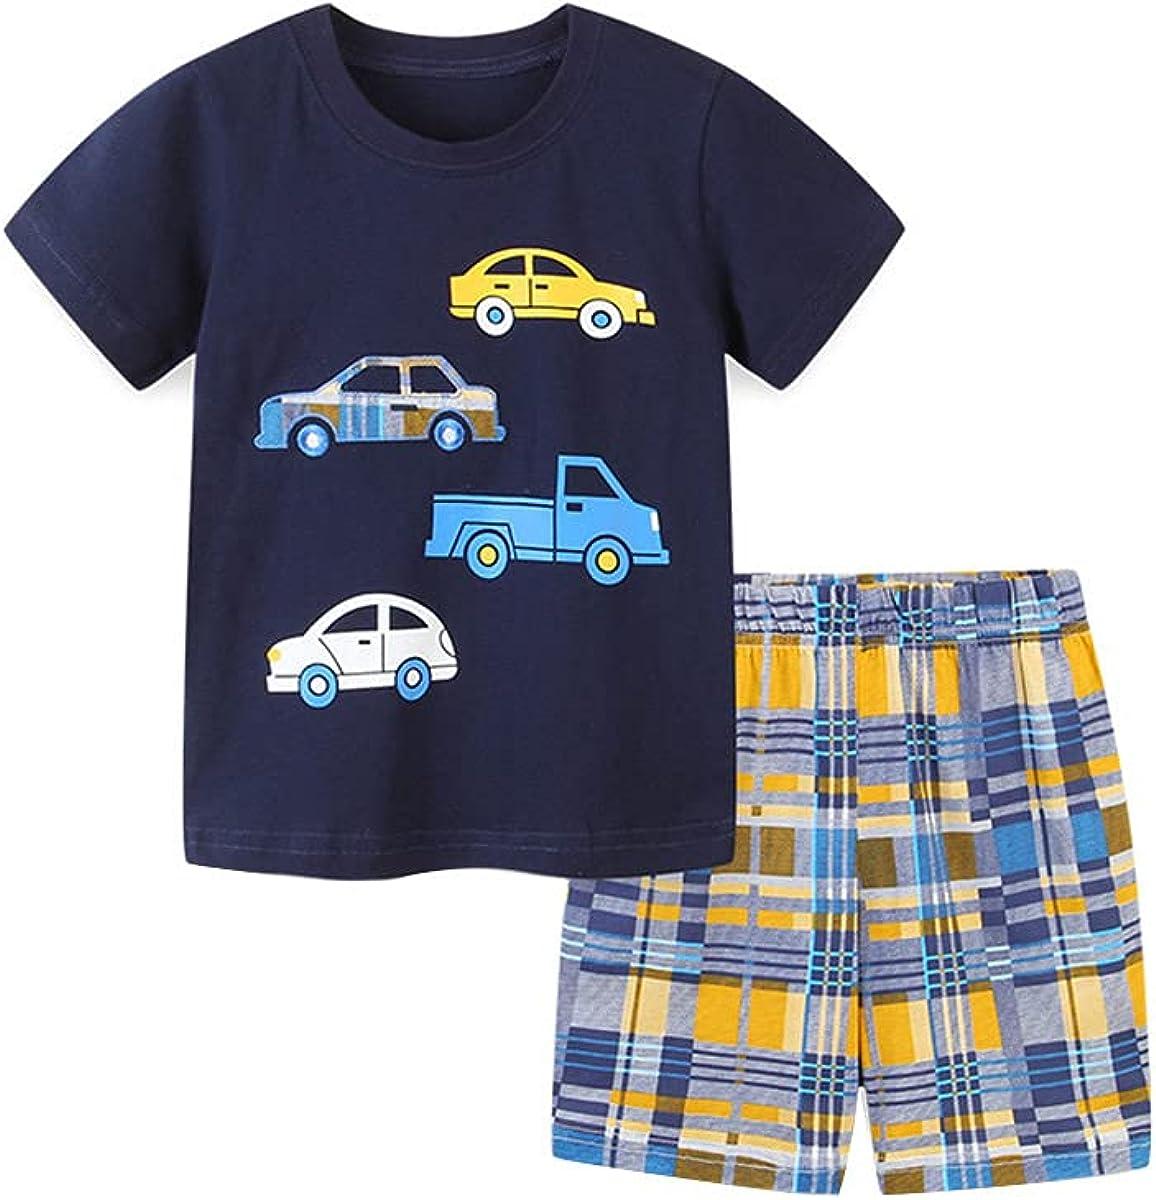 Rabuet Baby Boys' Summer Cute Cartoon Short Sleeve Shorts Cotton Outfit Set